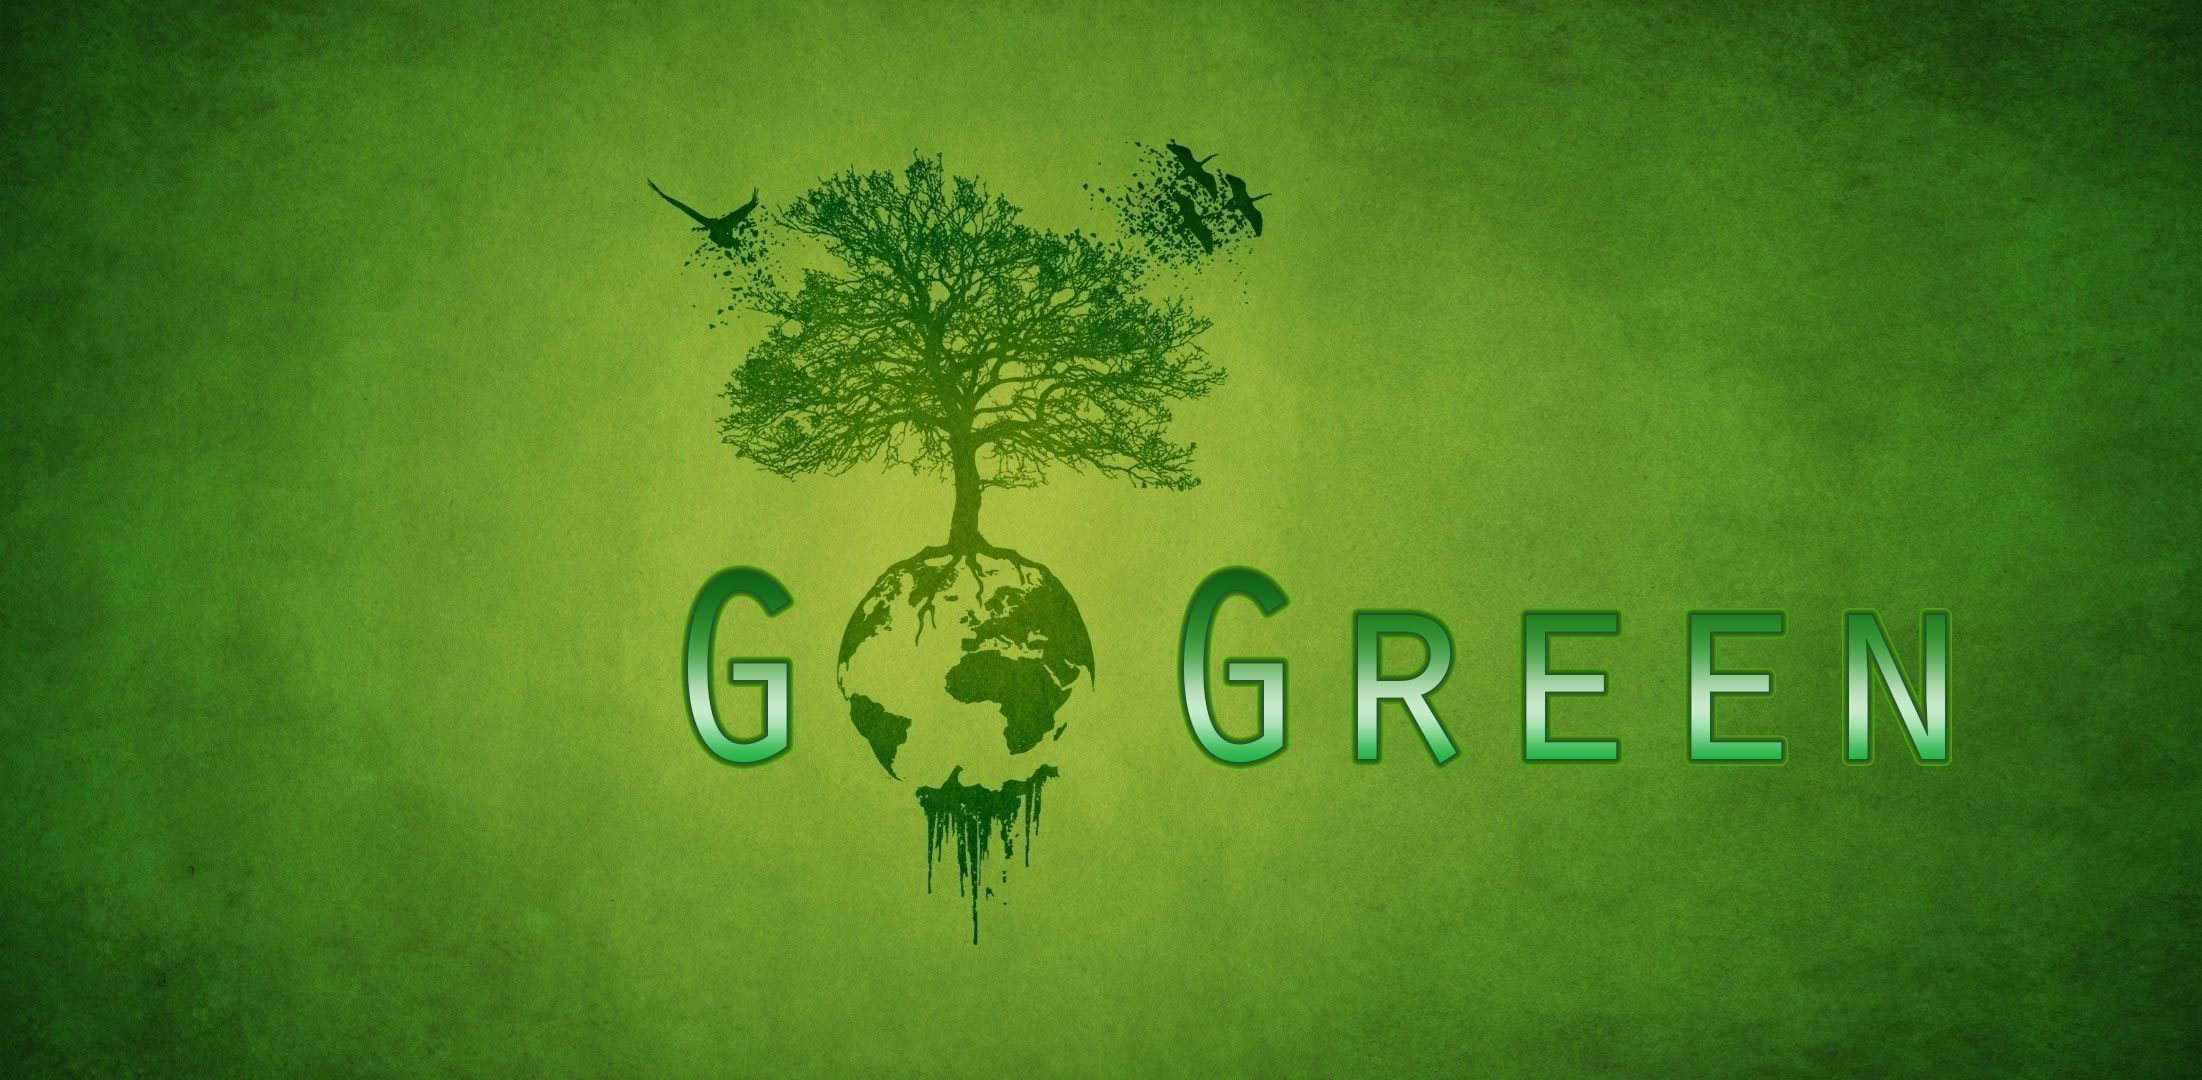 Go Green Wallpaper 2202x1080